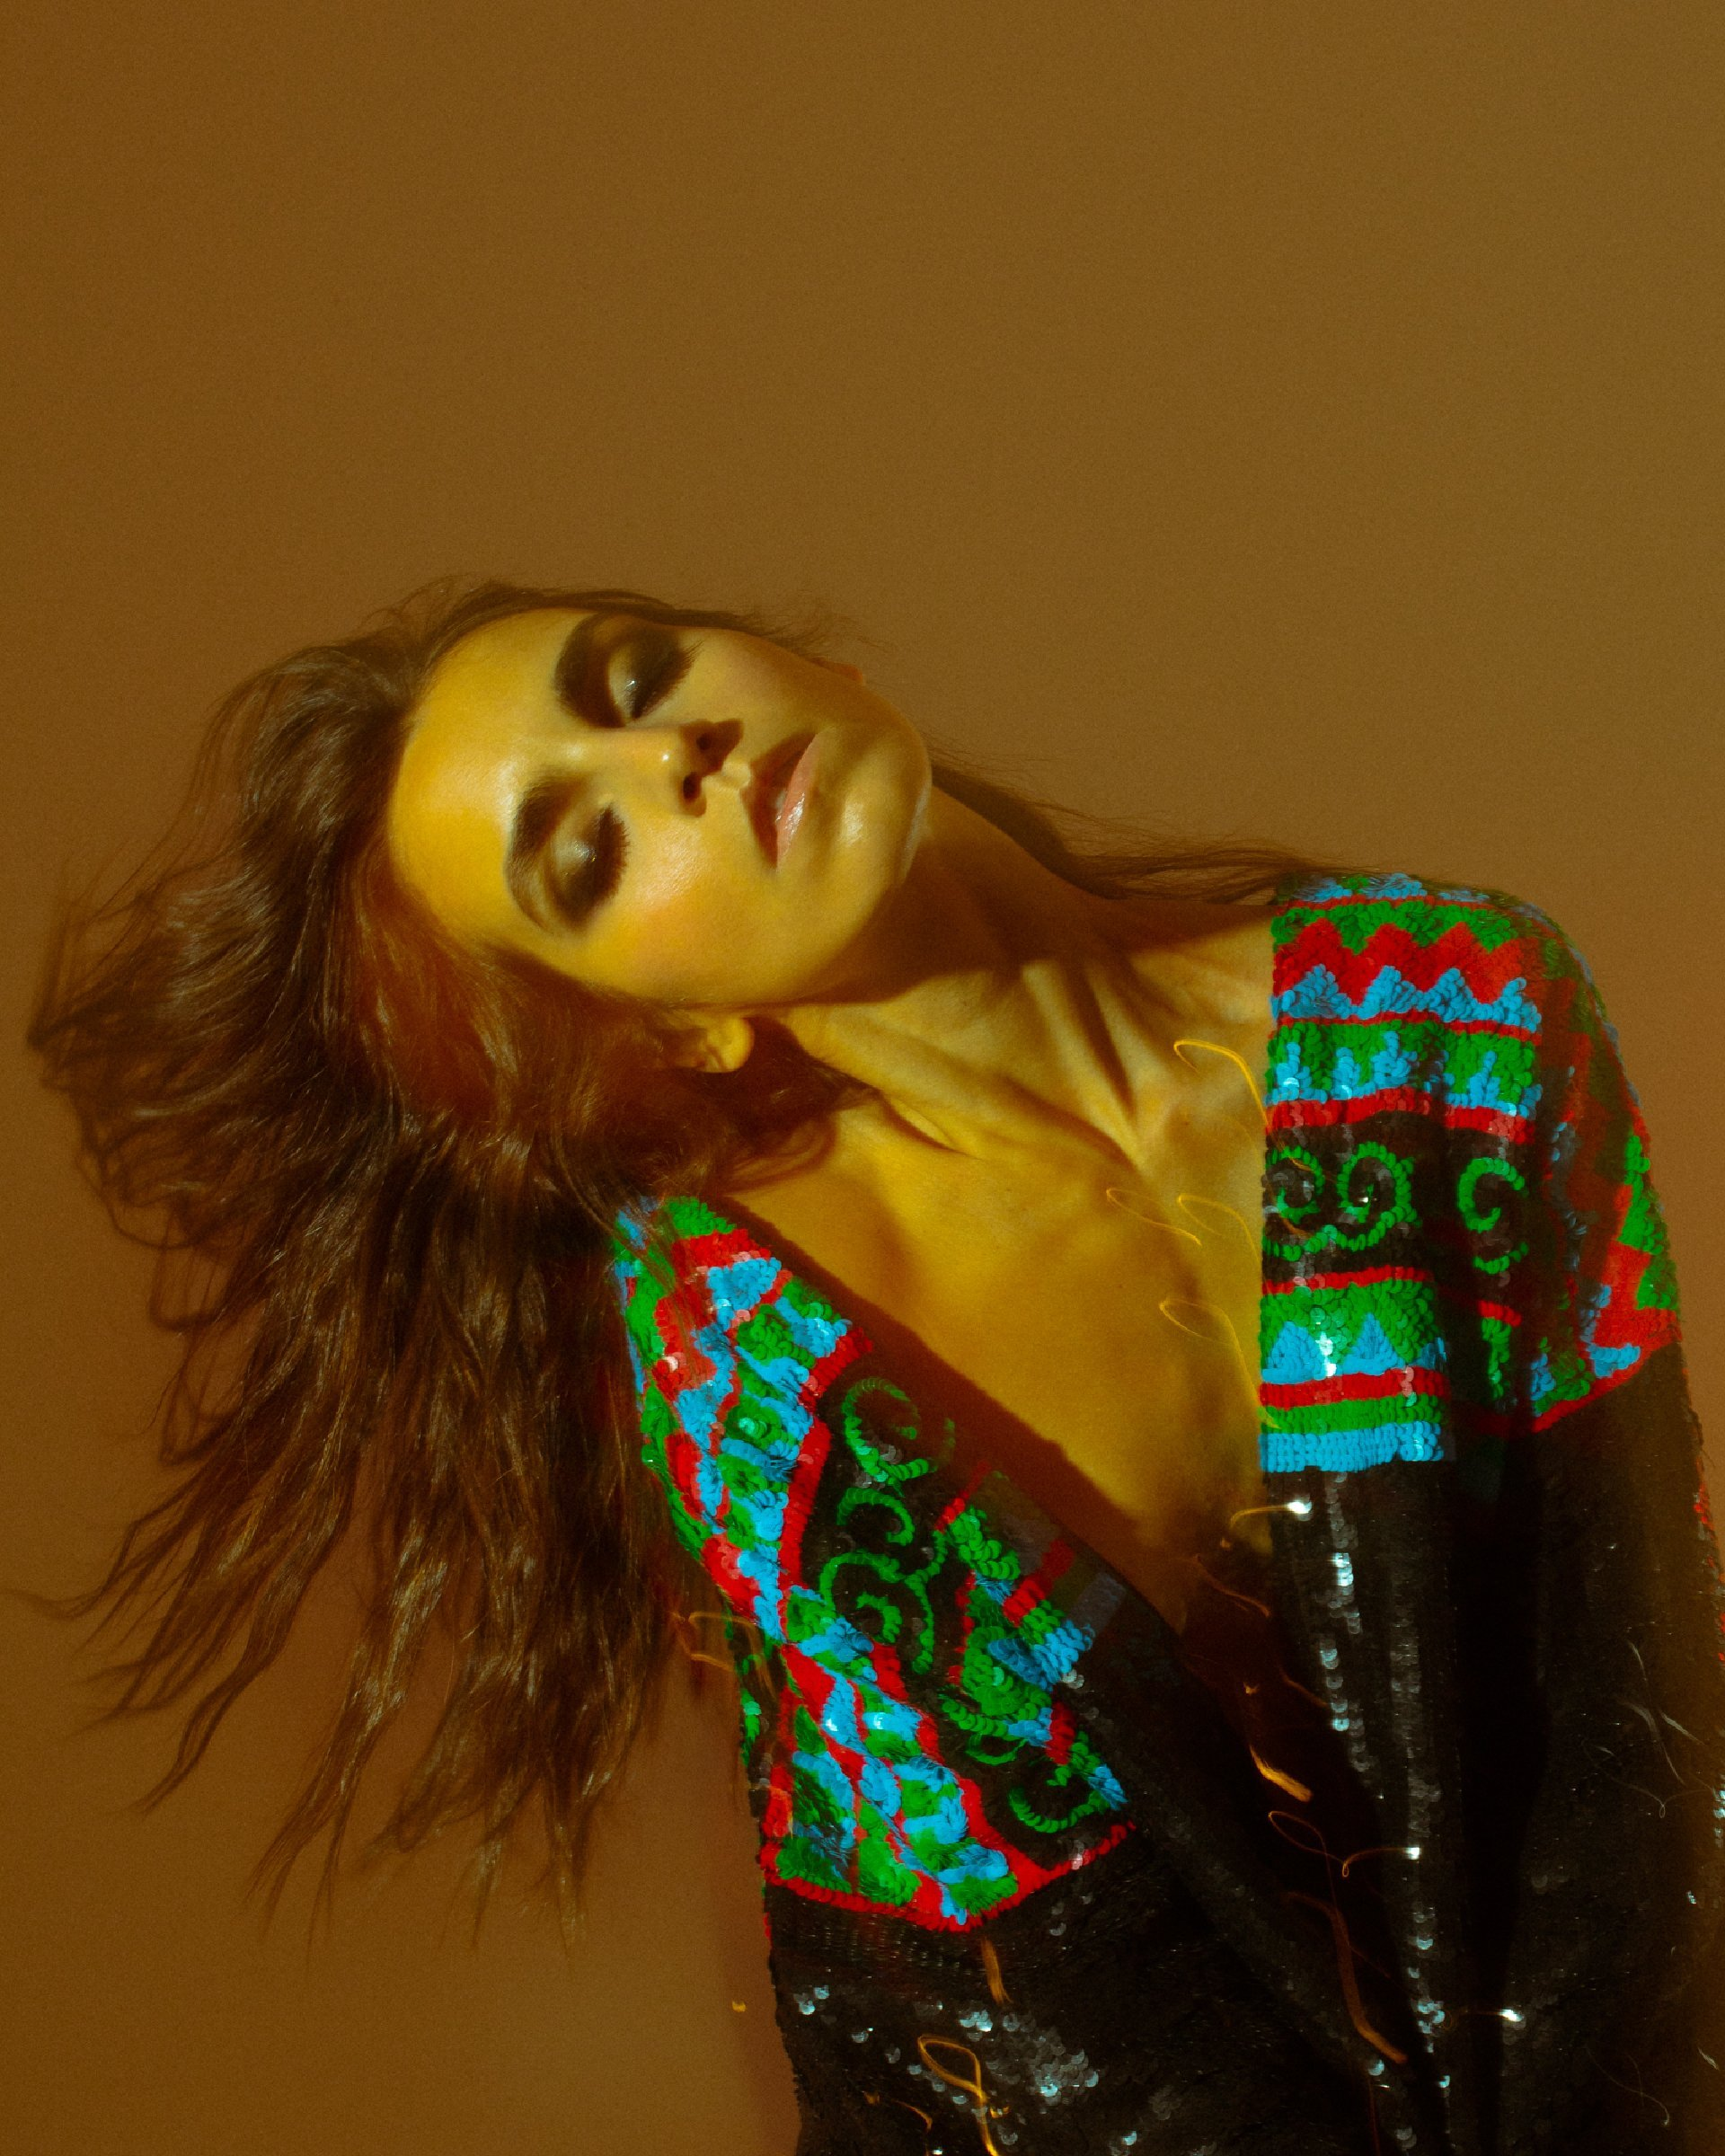 the fashion atlas, gaetano giordano, fashion photography